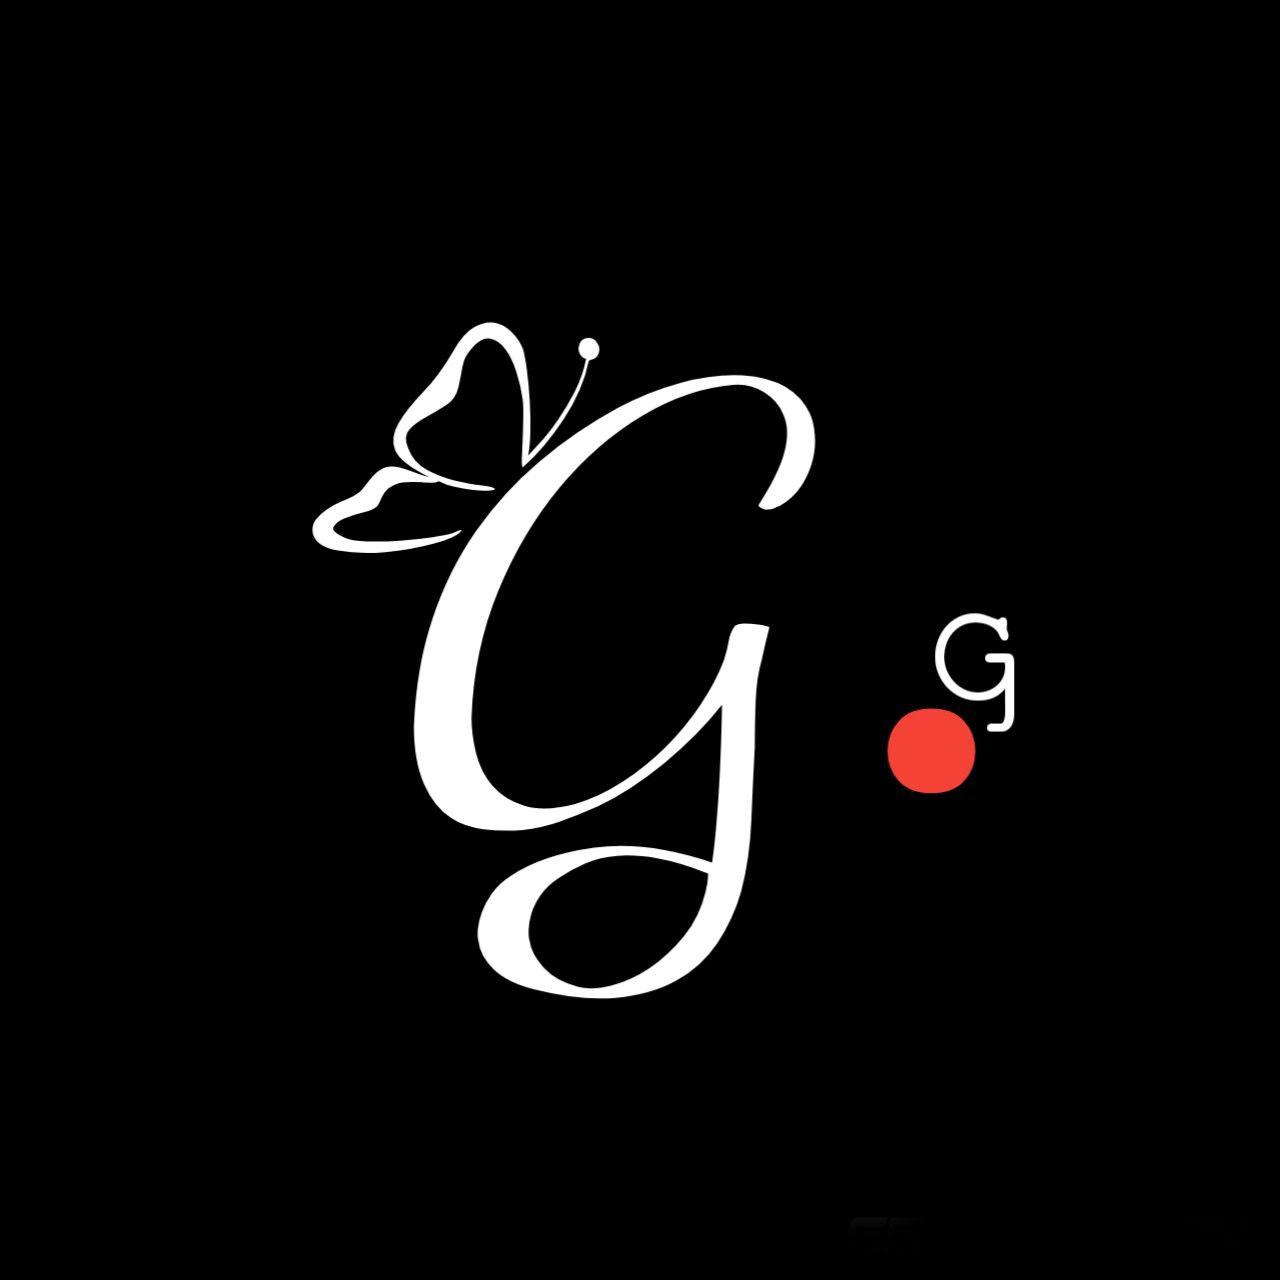 G free Alphabet Dp Images